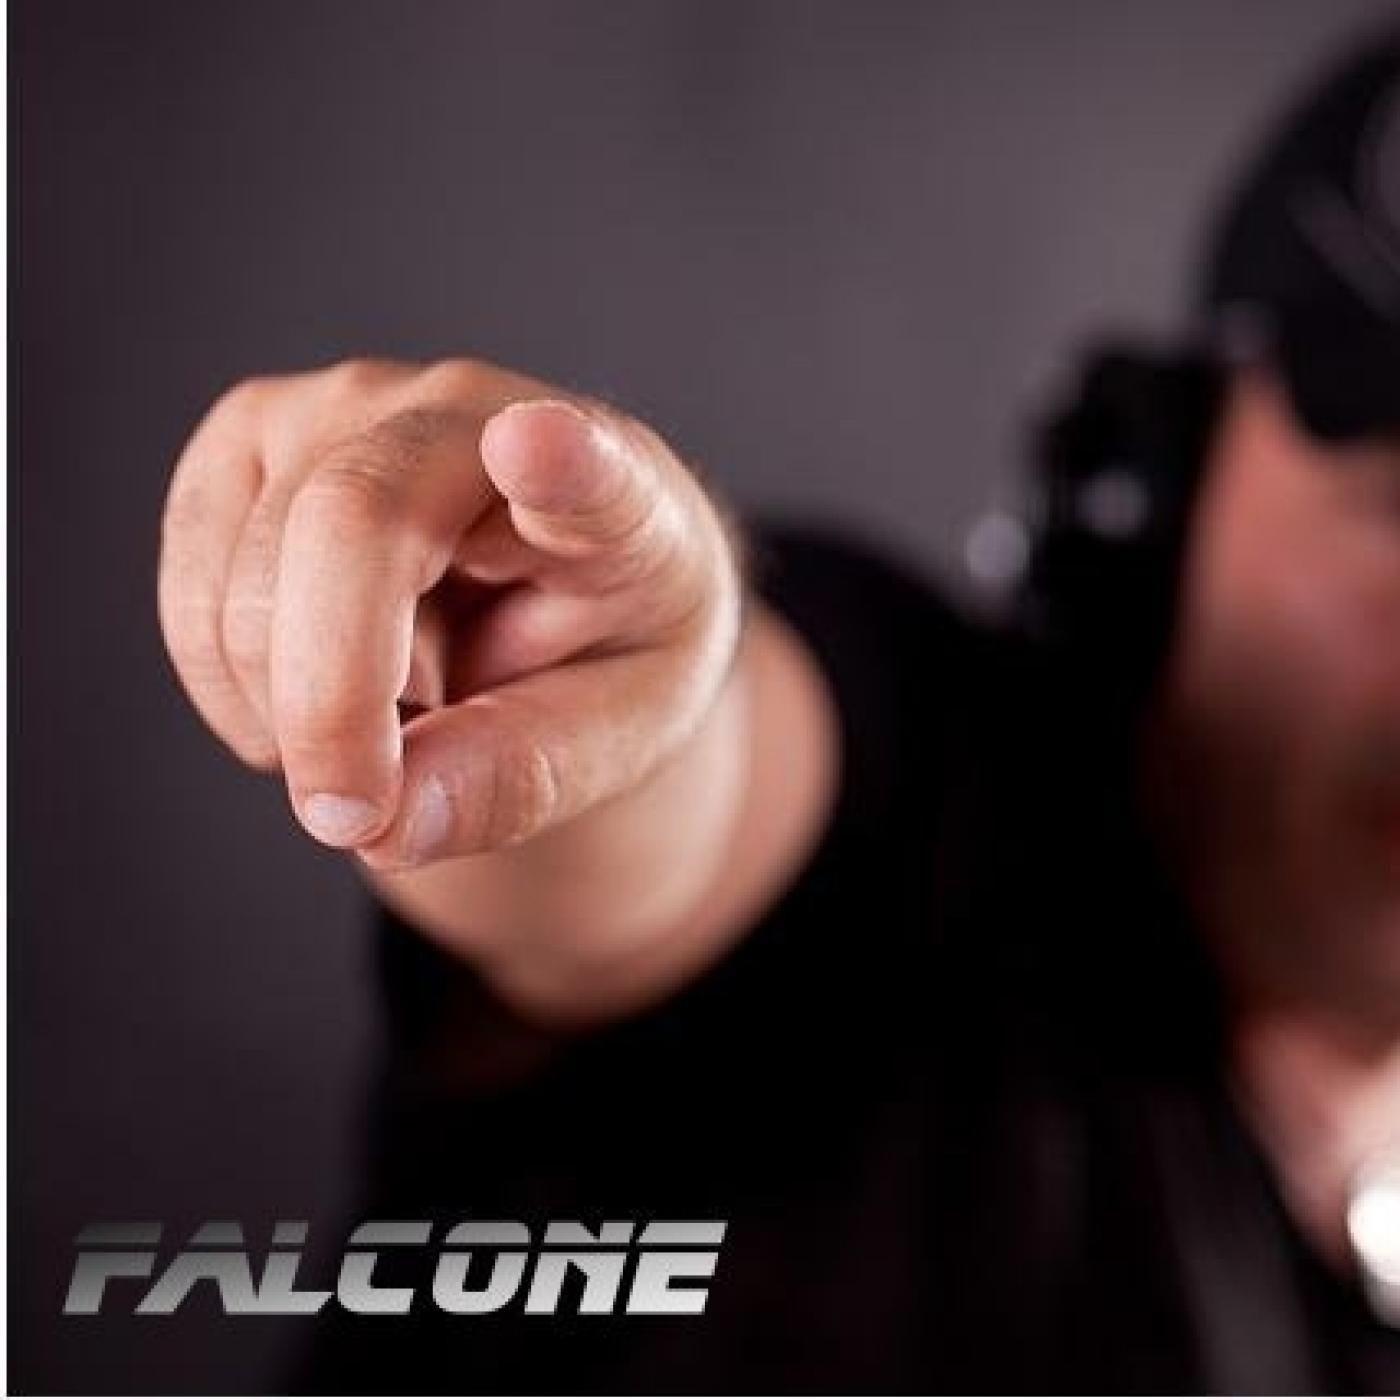 Dj Falcone